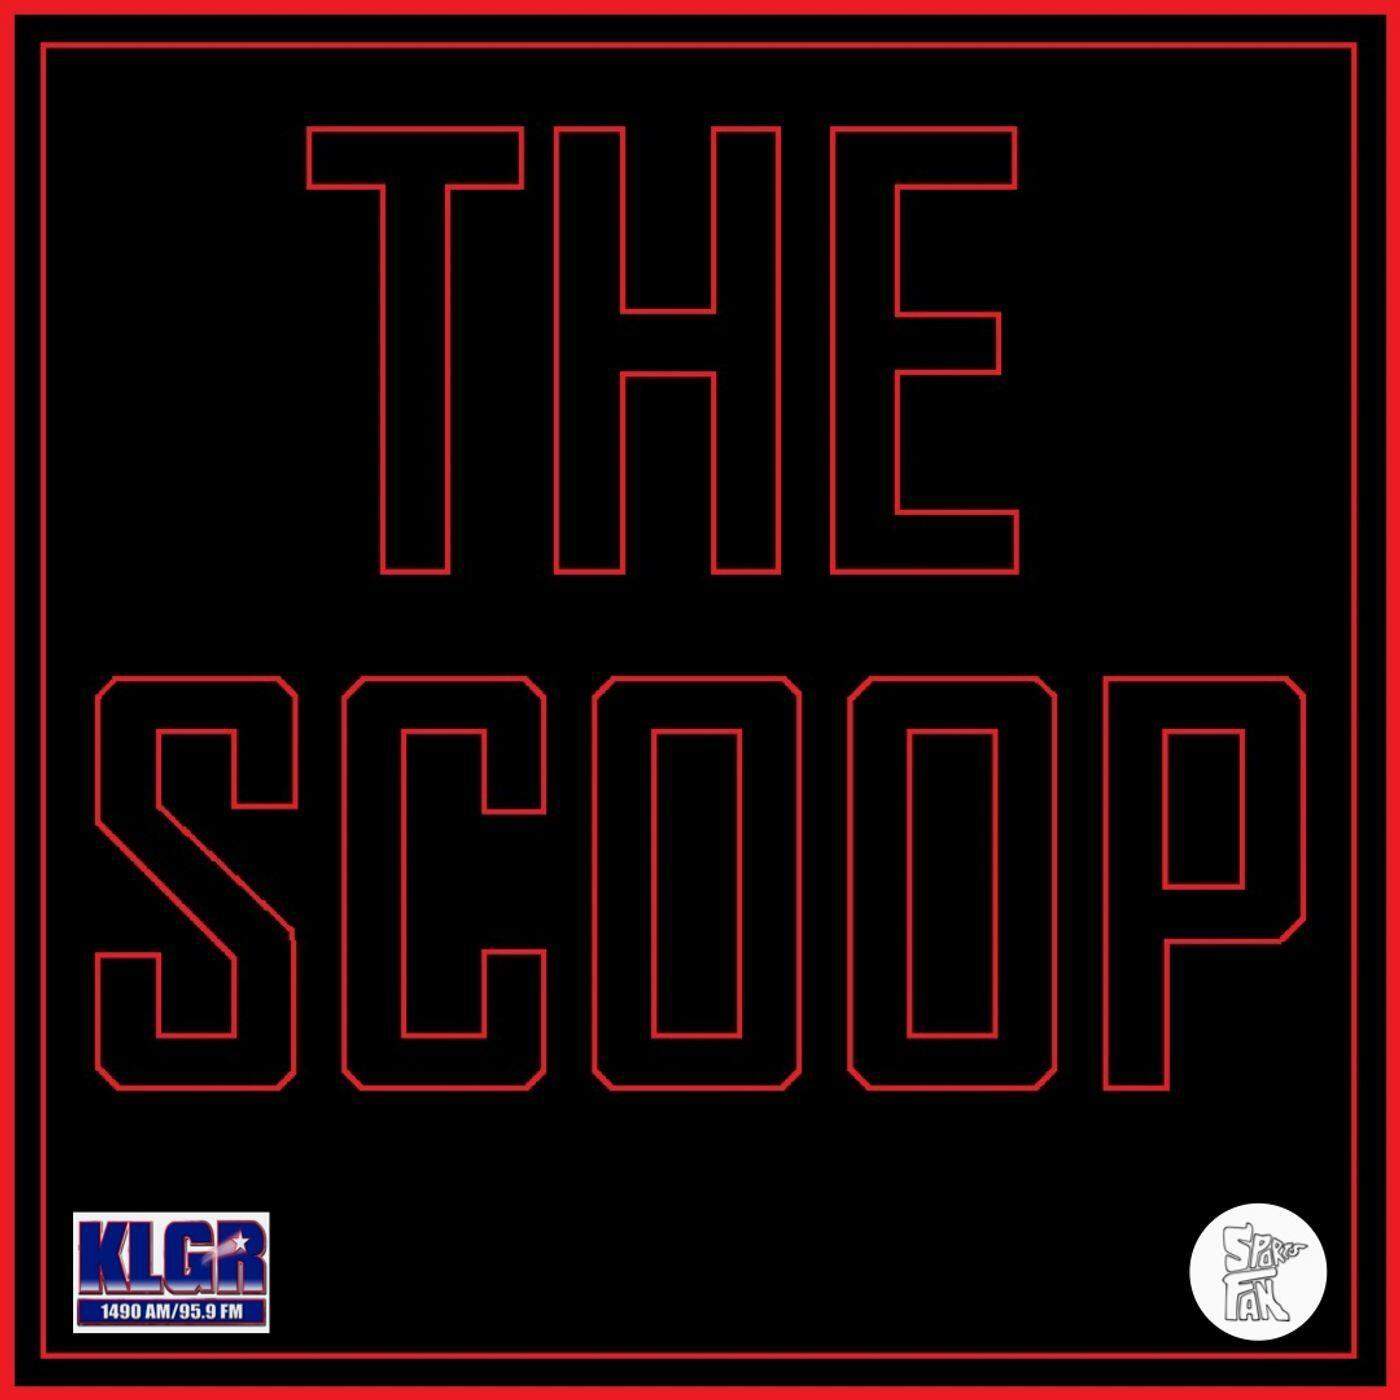 The Scoop (KLGR Radio)